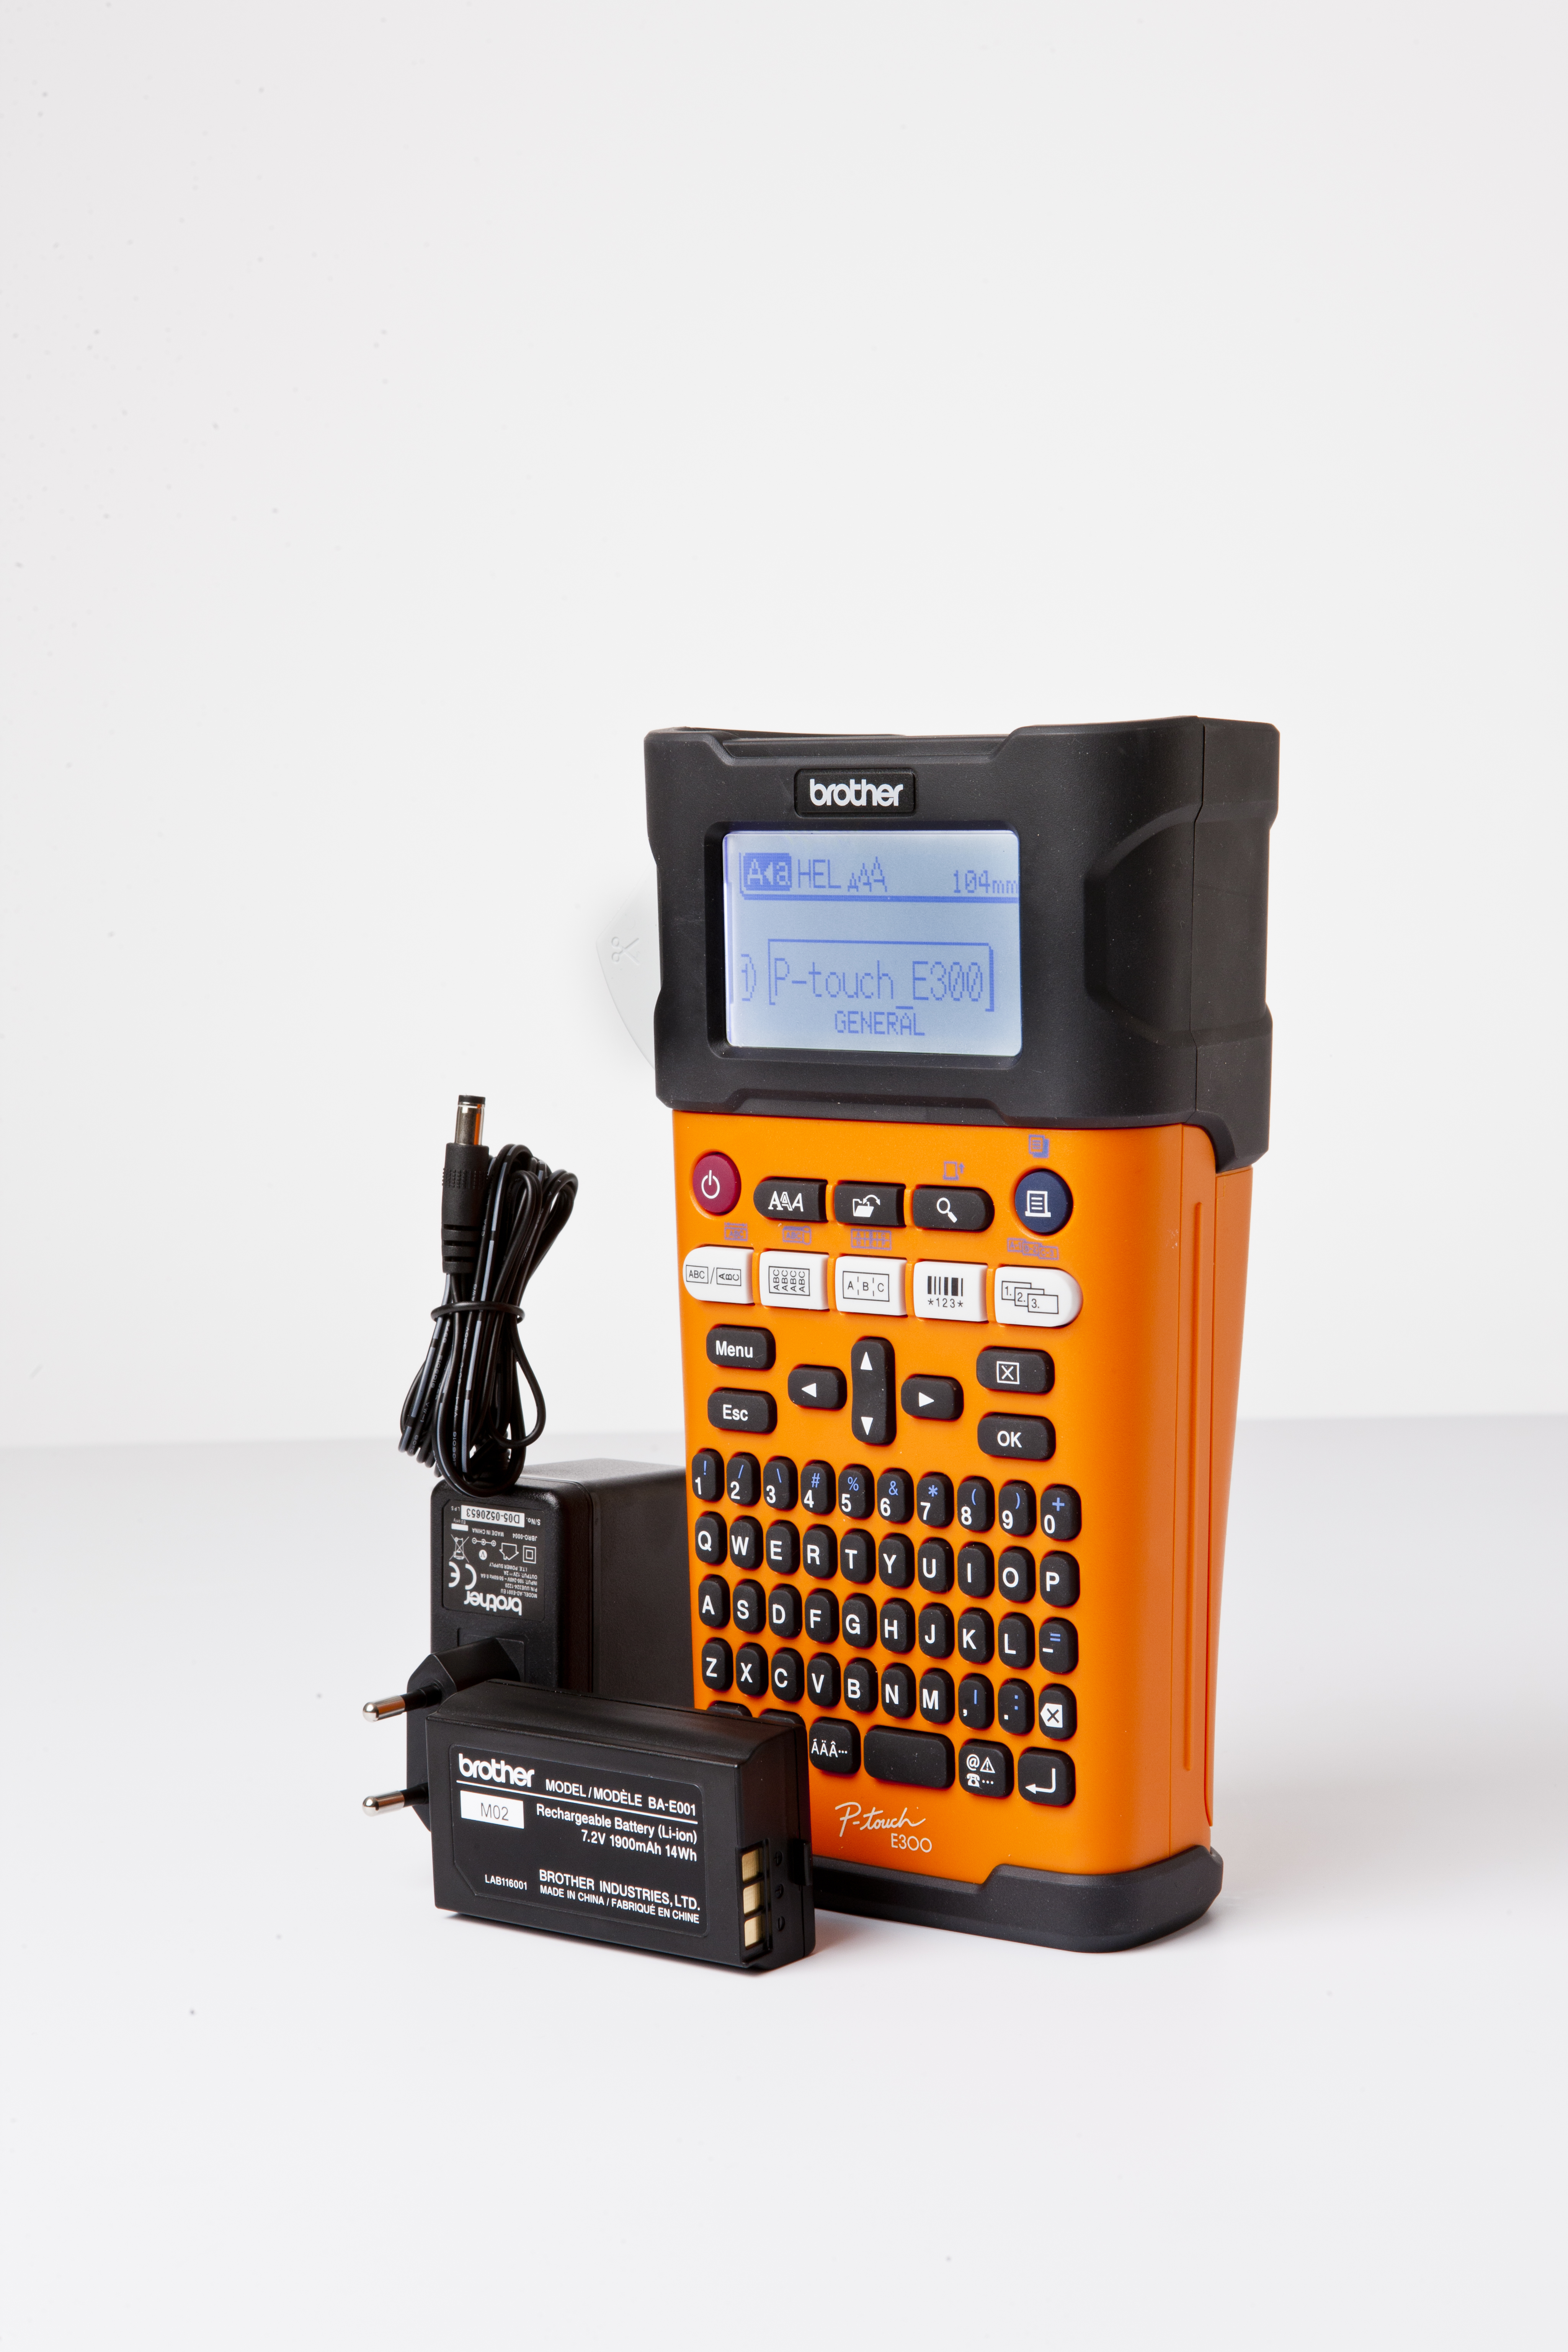 Brother P-touch E300VP Beschriftungsgerät - Etiketten-/Labeldrucker - Thermotransferdruck